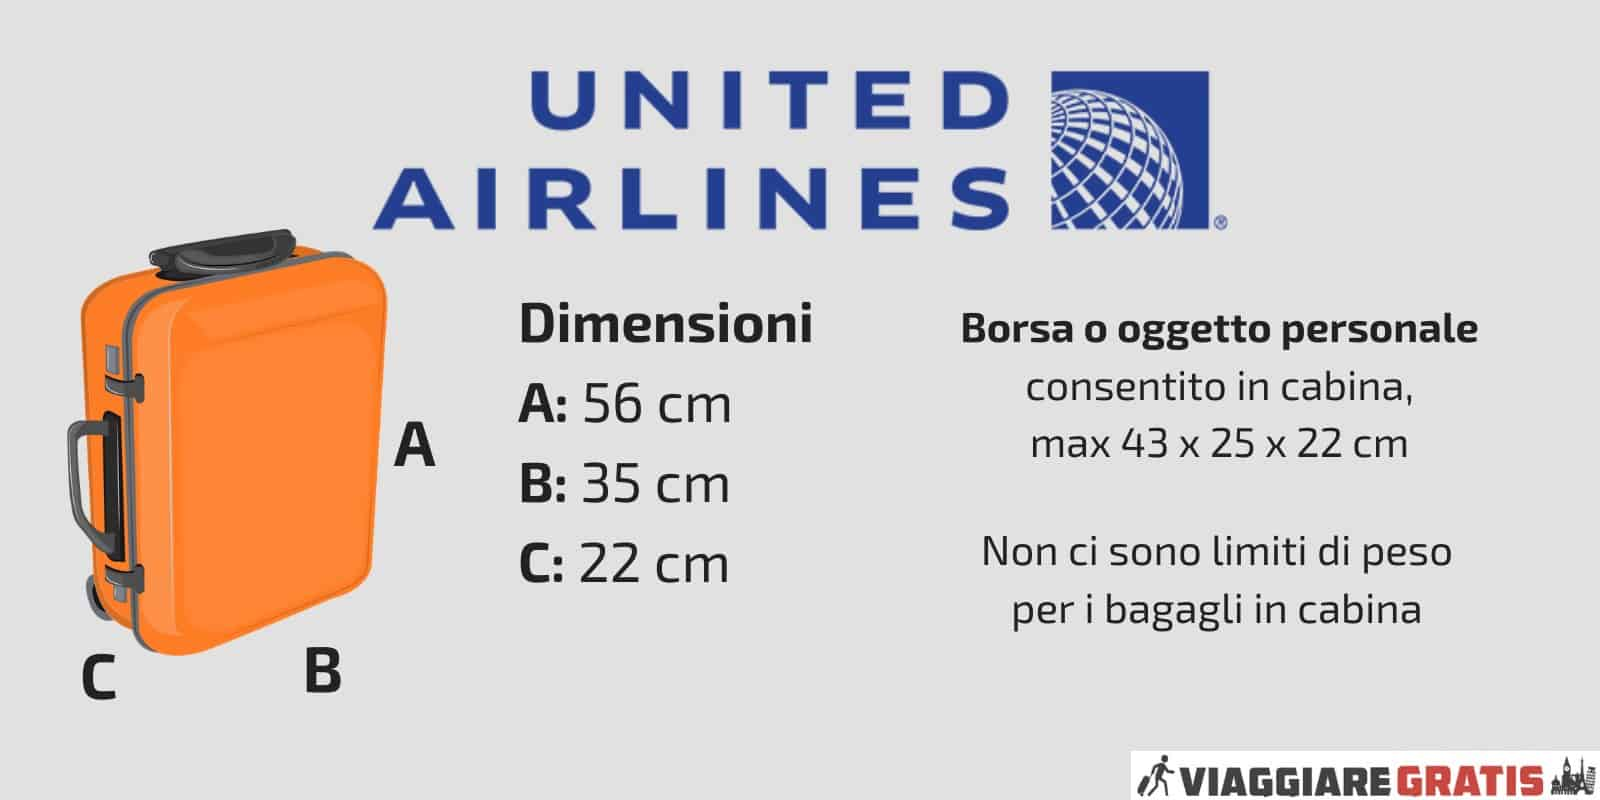 Bagaglio a Mano United Airlines